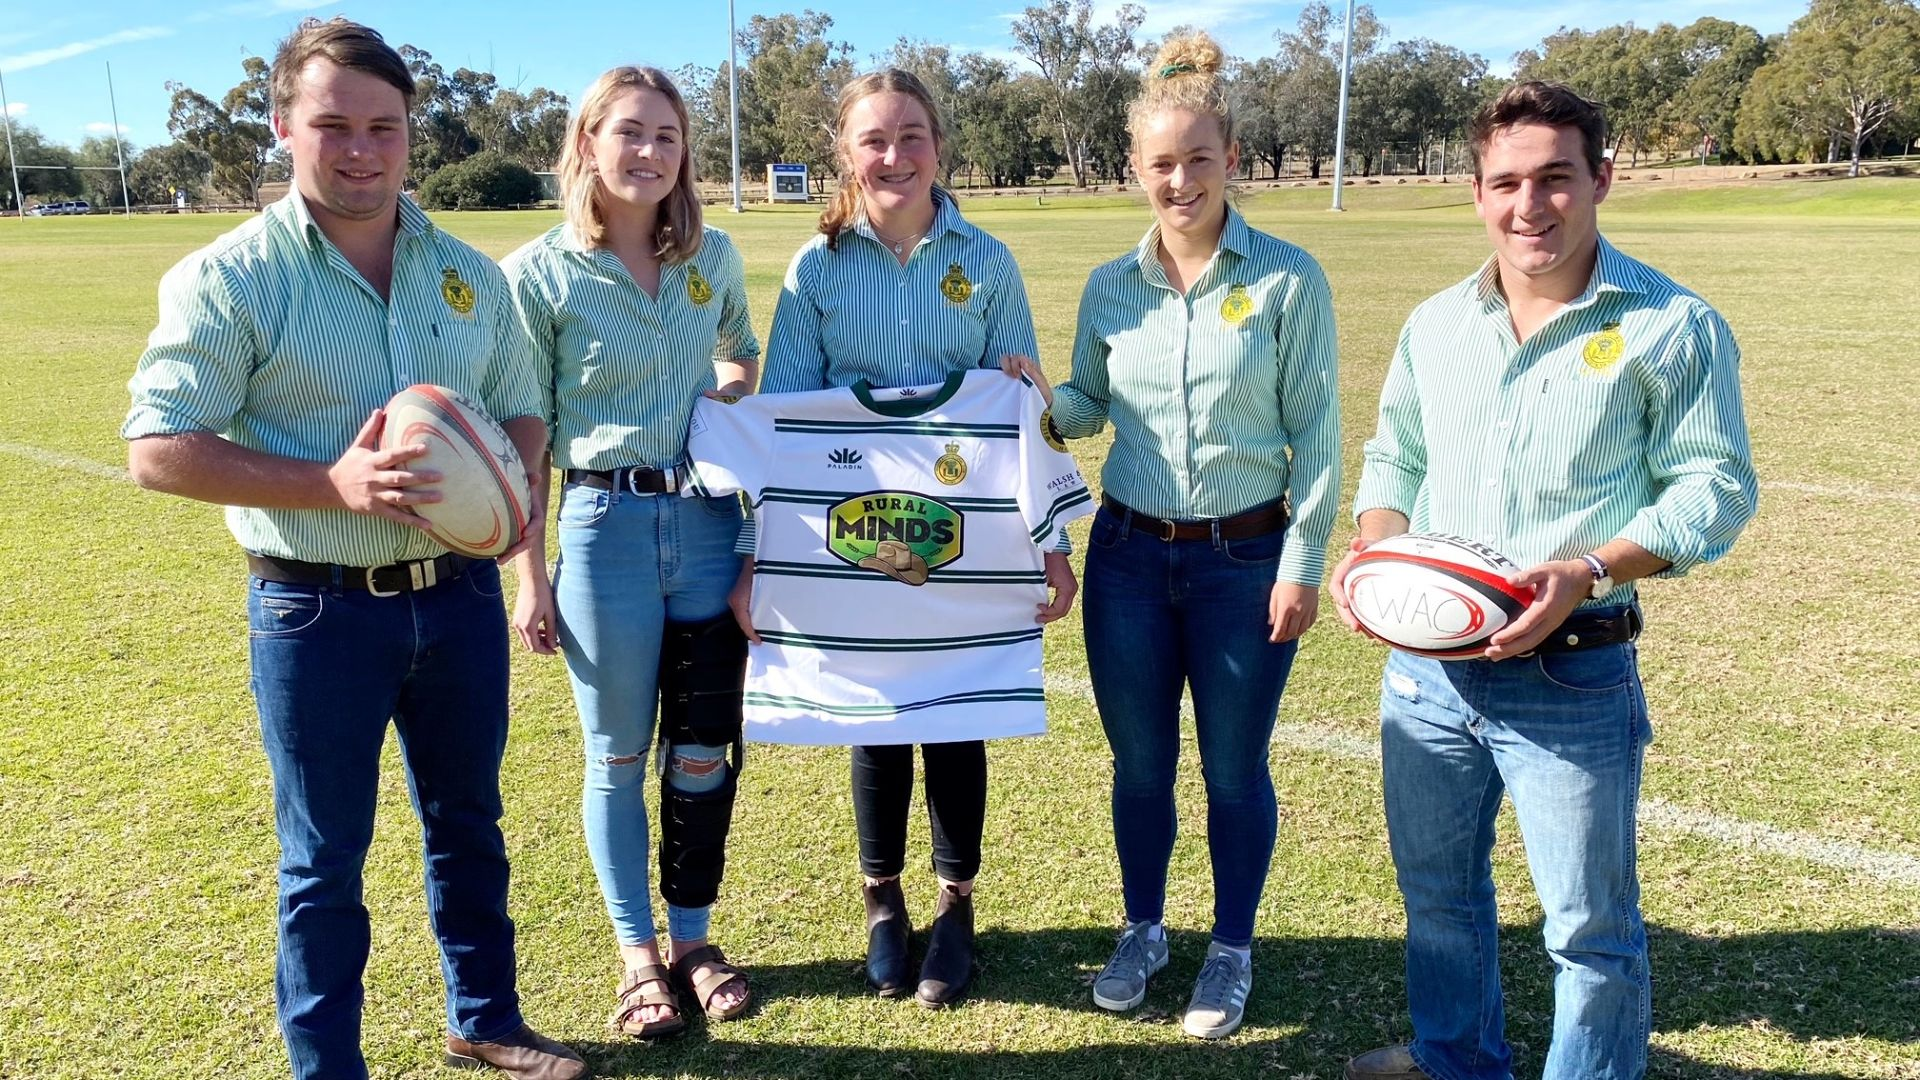 University rugby team kicks goals for mental health